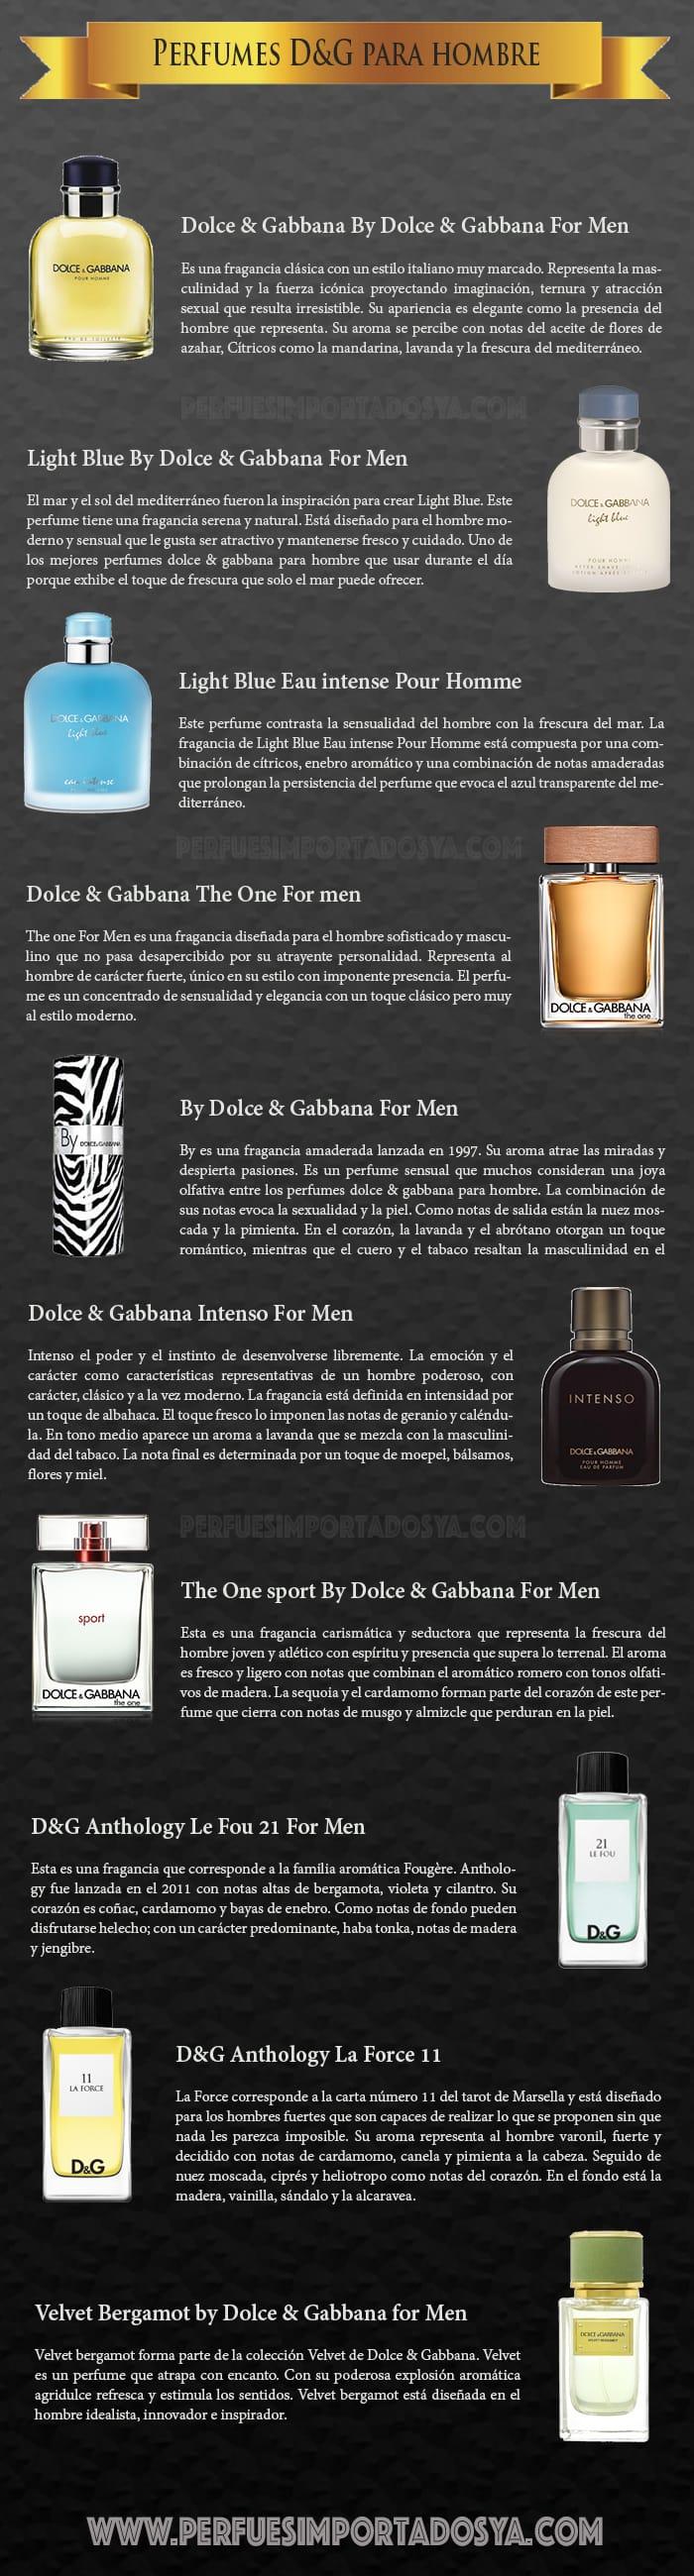 perfumes dolce & gabbana para hombre